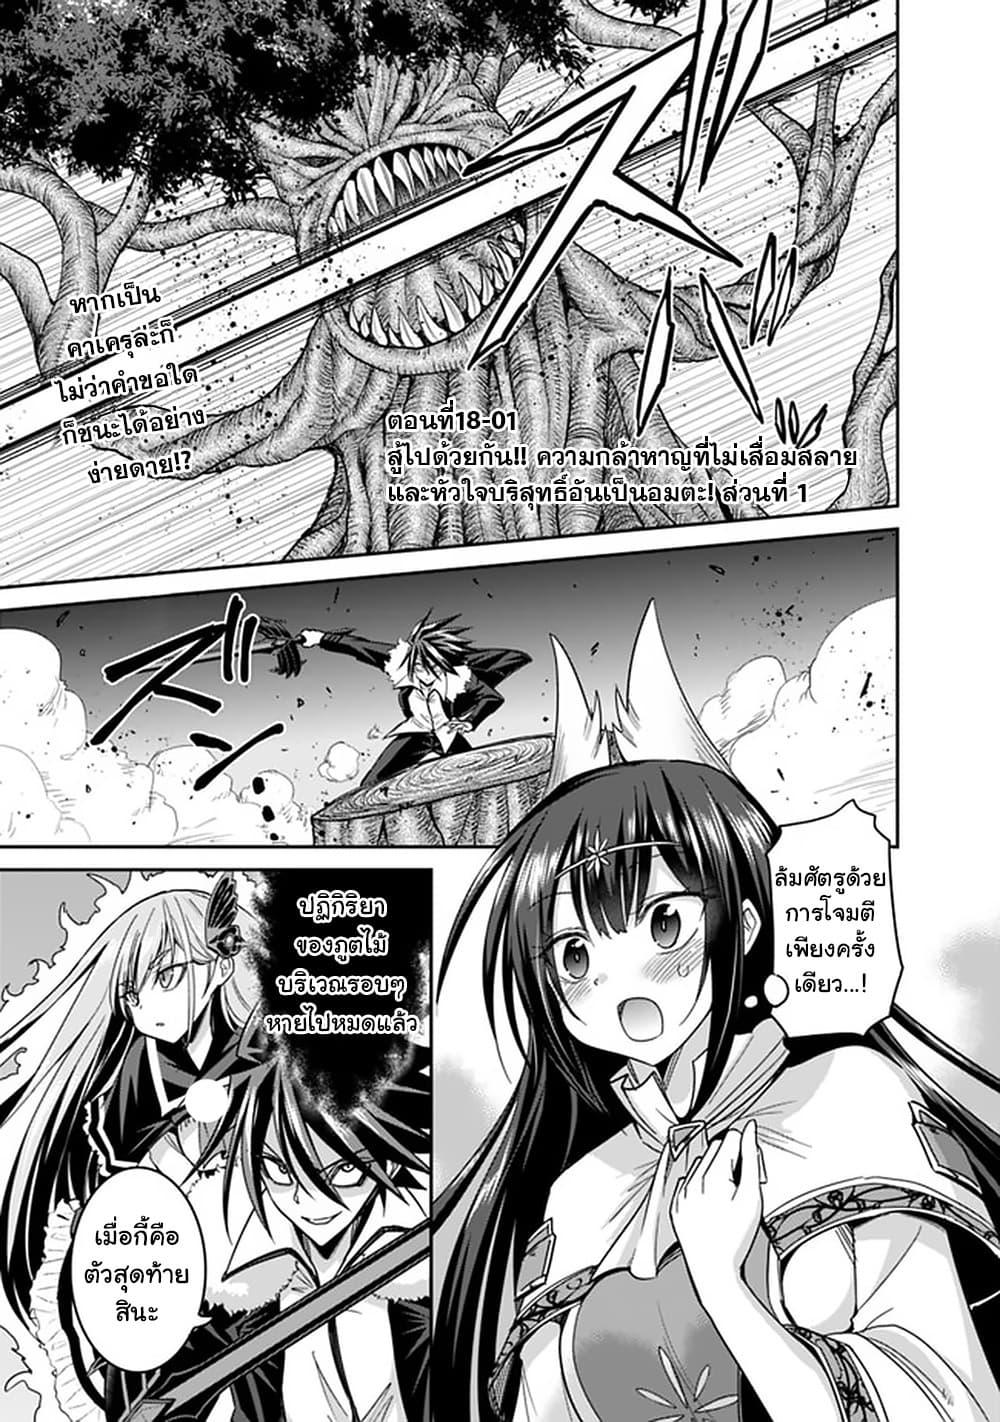 Kujibiki Tokushou: Musou Harem-ken-ตอนที่ 18.1